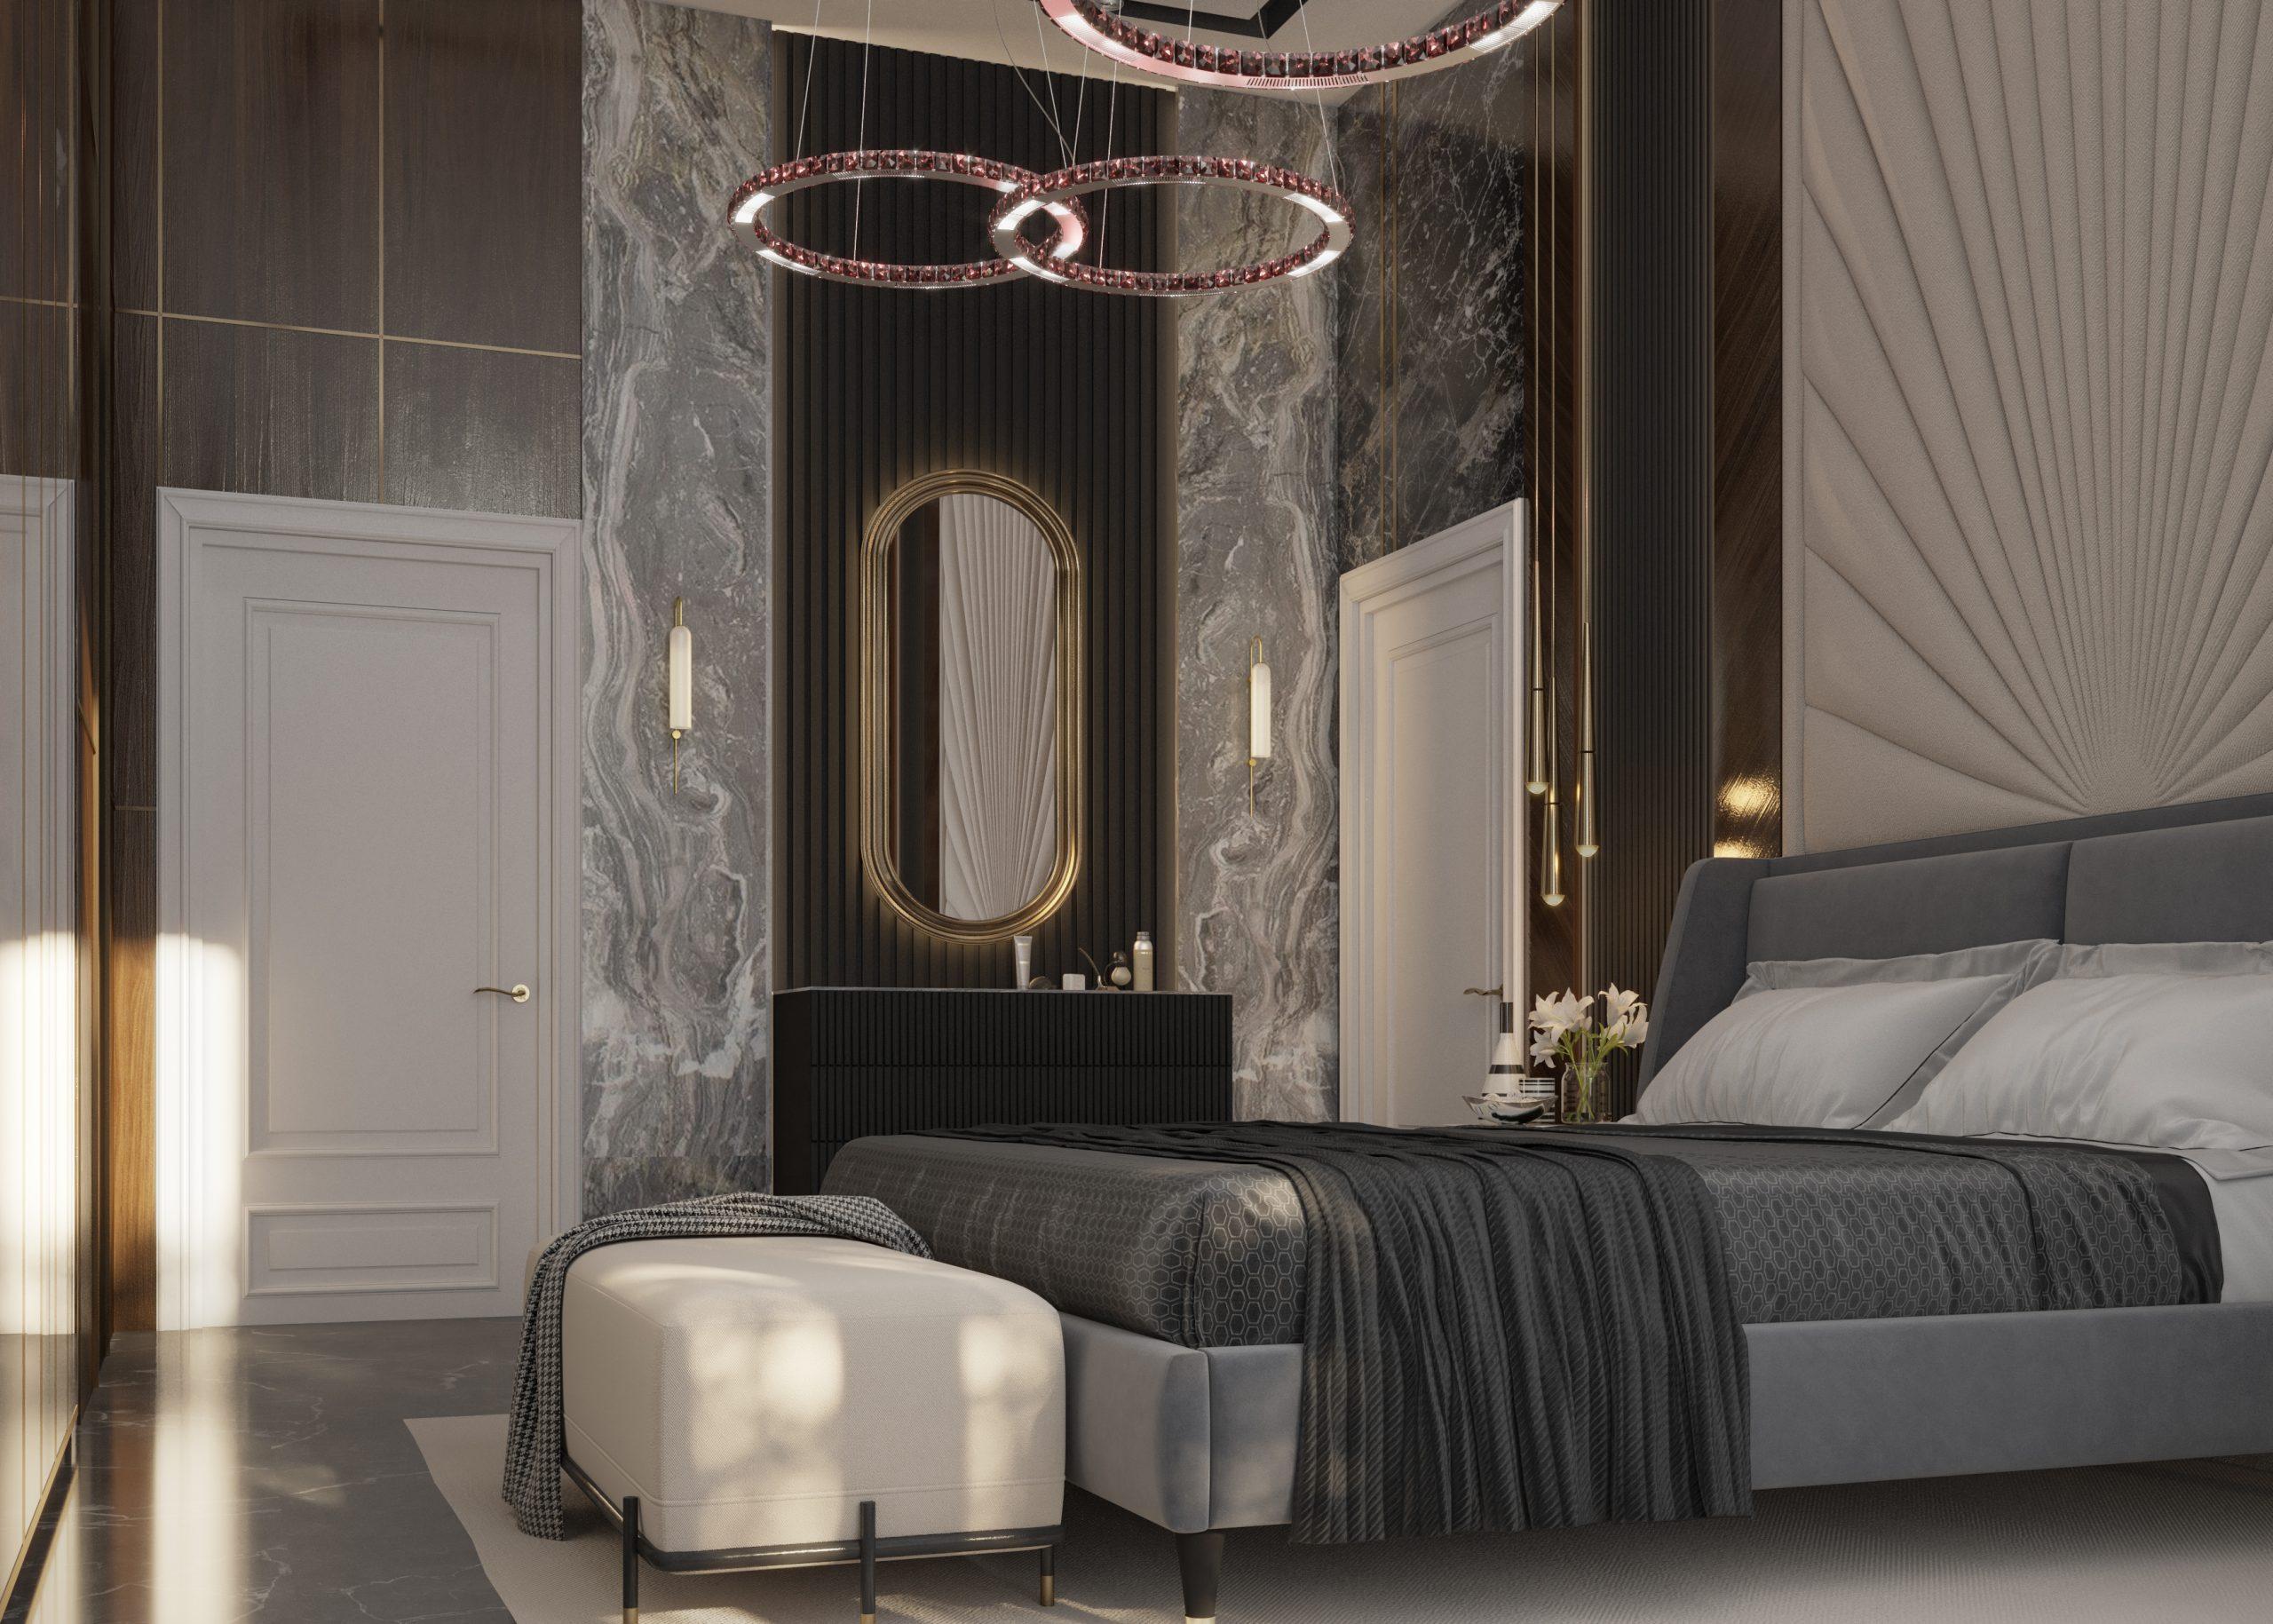 BEDROOM MODERN DESIGN - WOOD - CEILING LIGHT